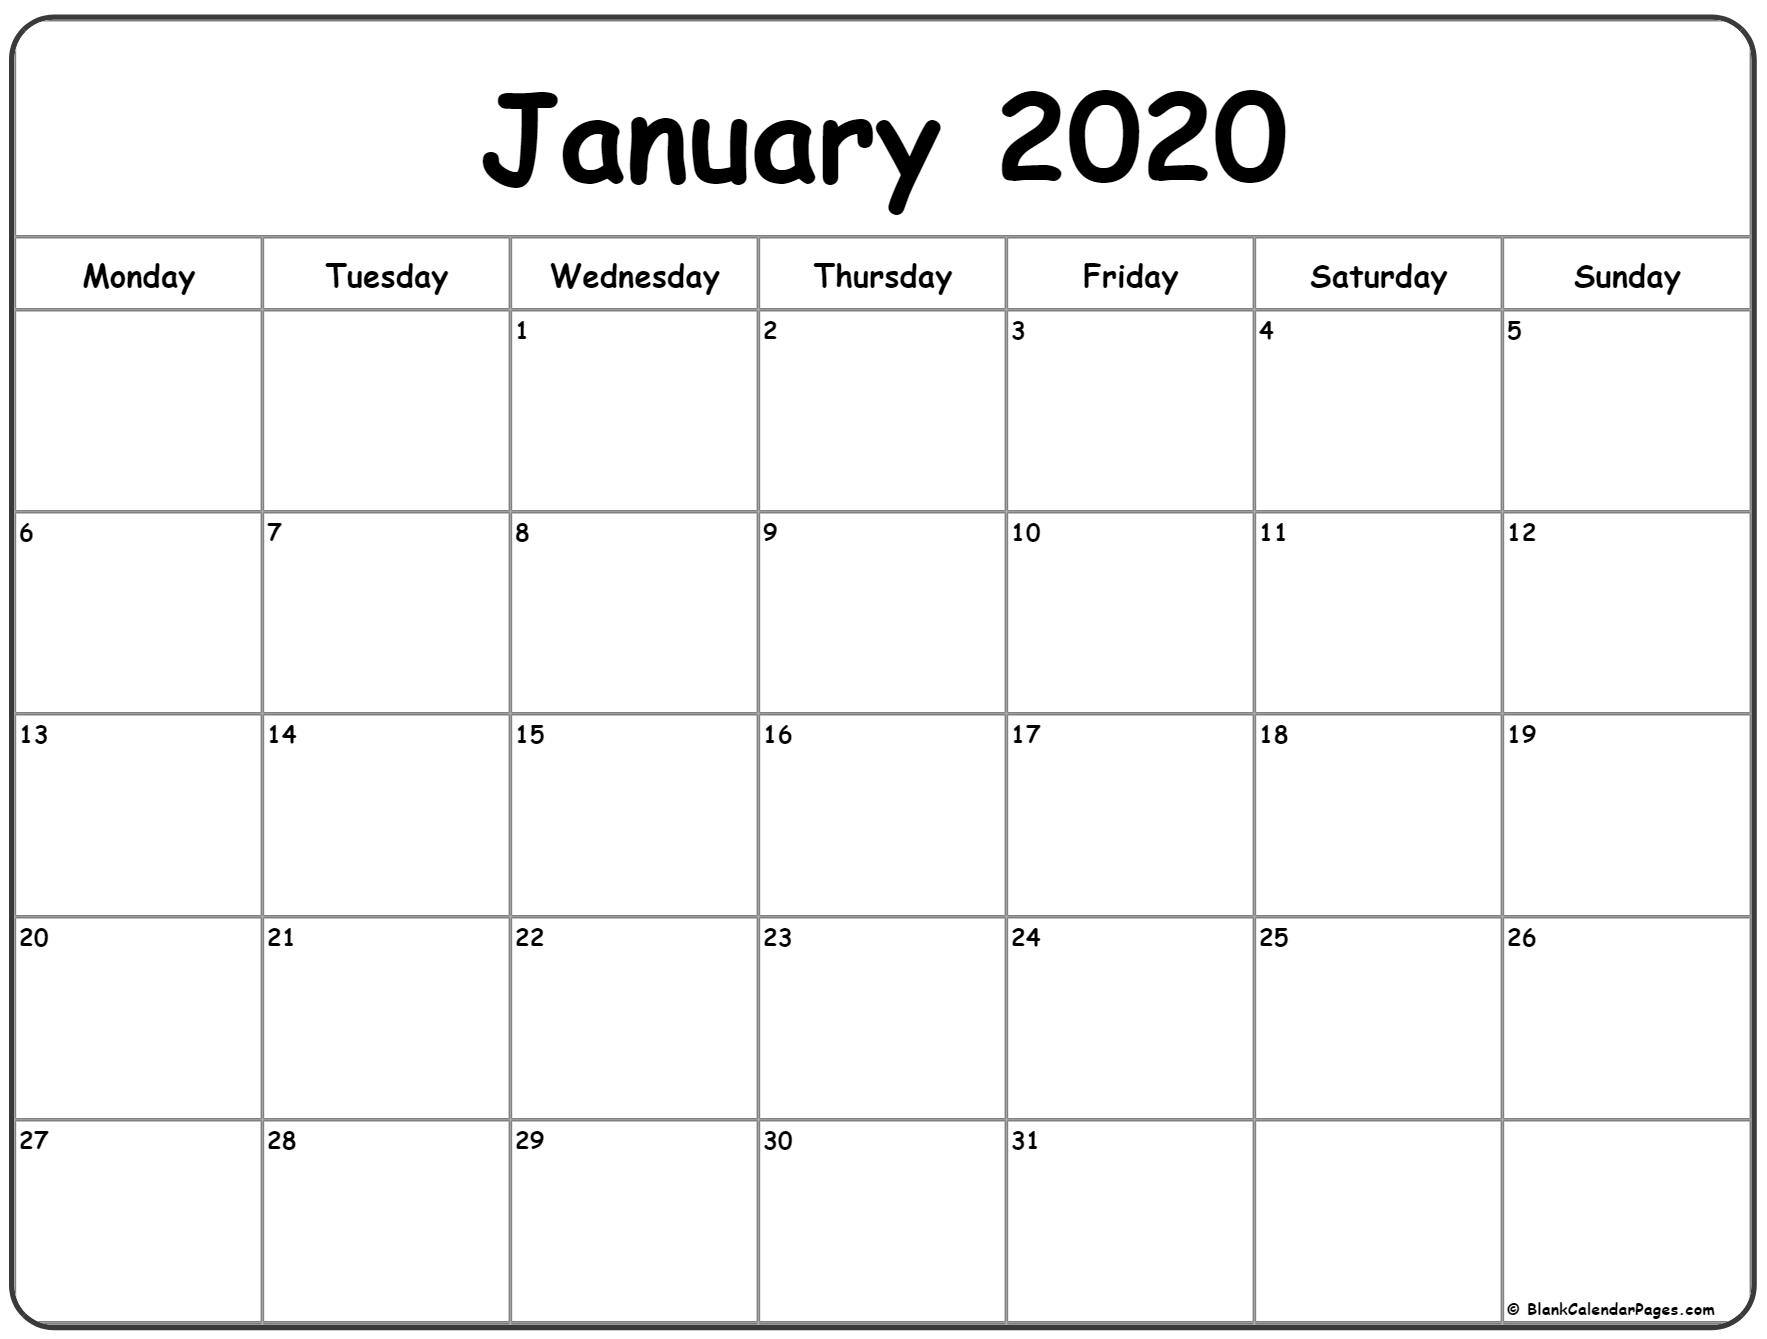 January 2020 Monday Calendar | Monday To Sunday intended for January 2020 Calendar Starting Monday